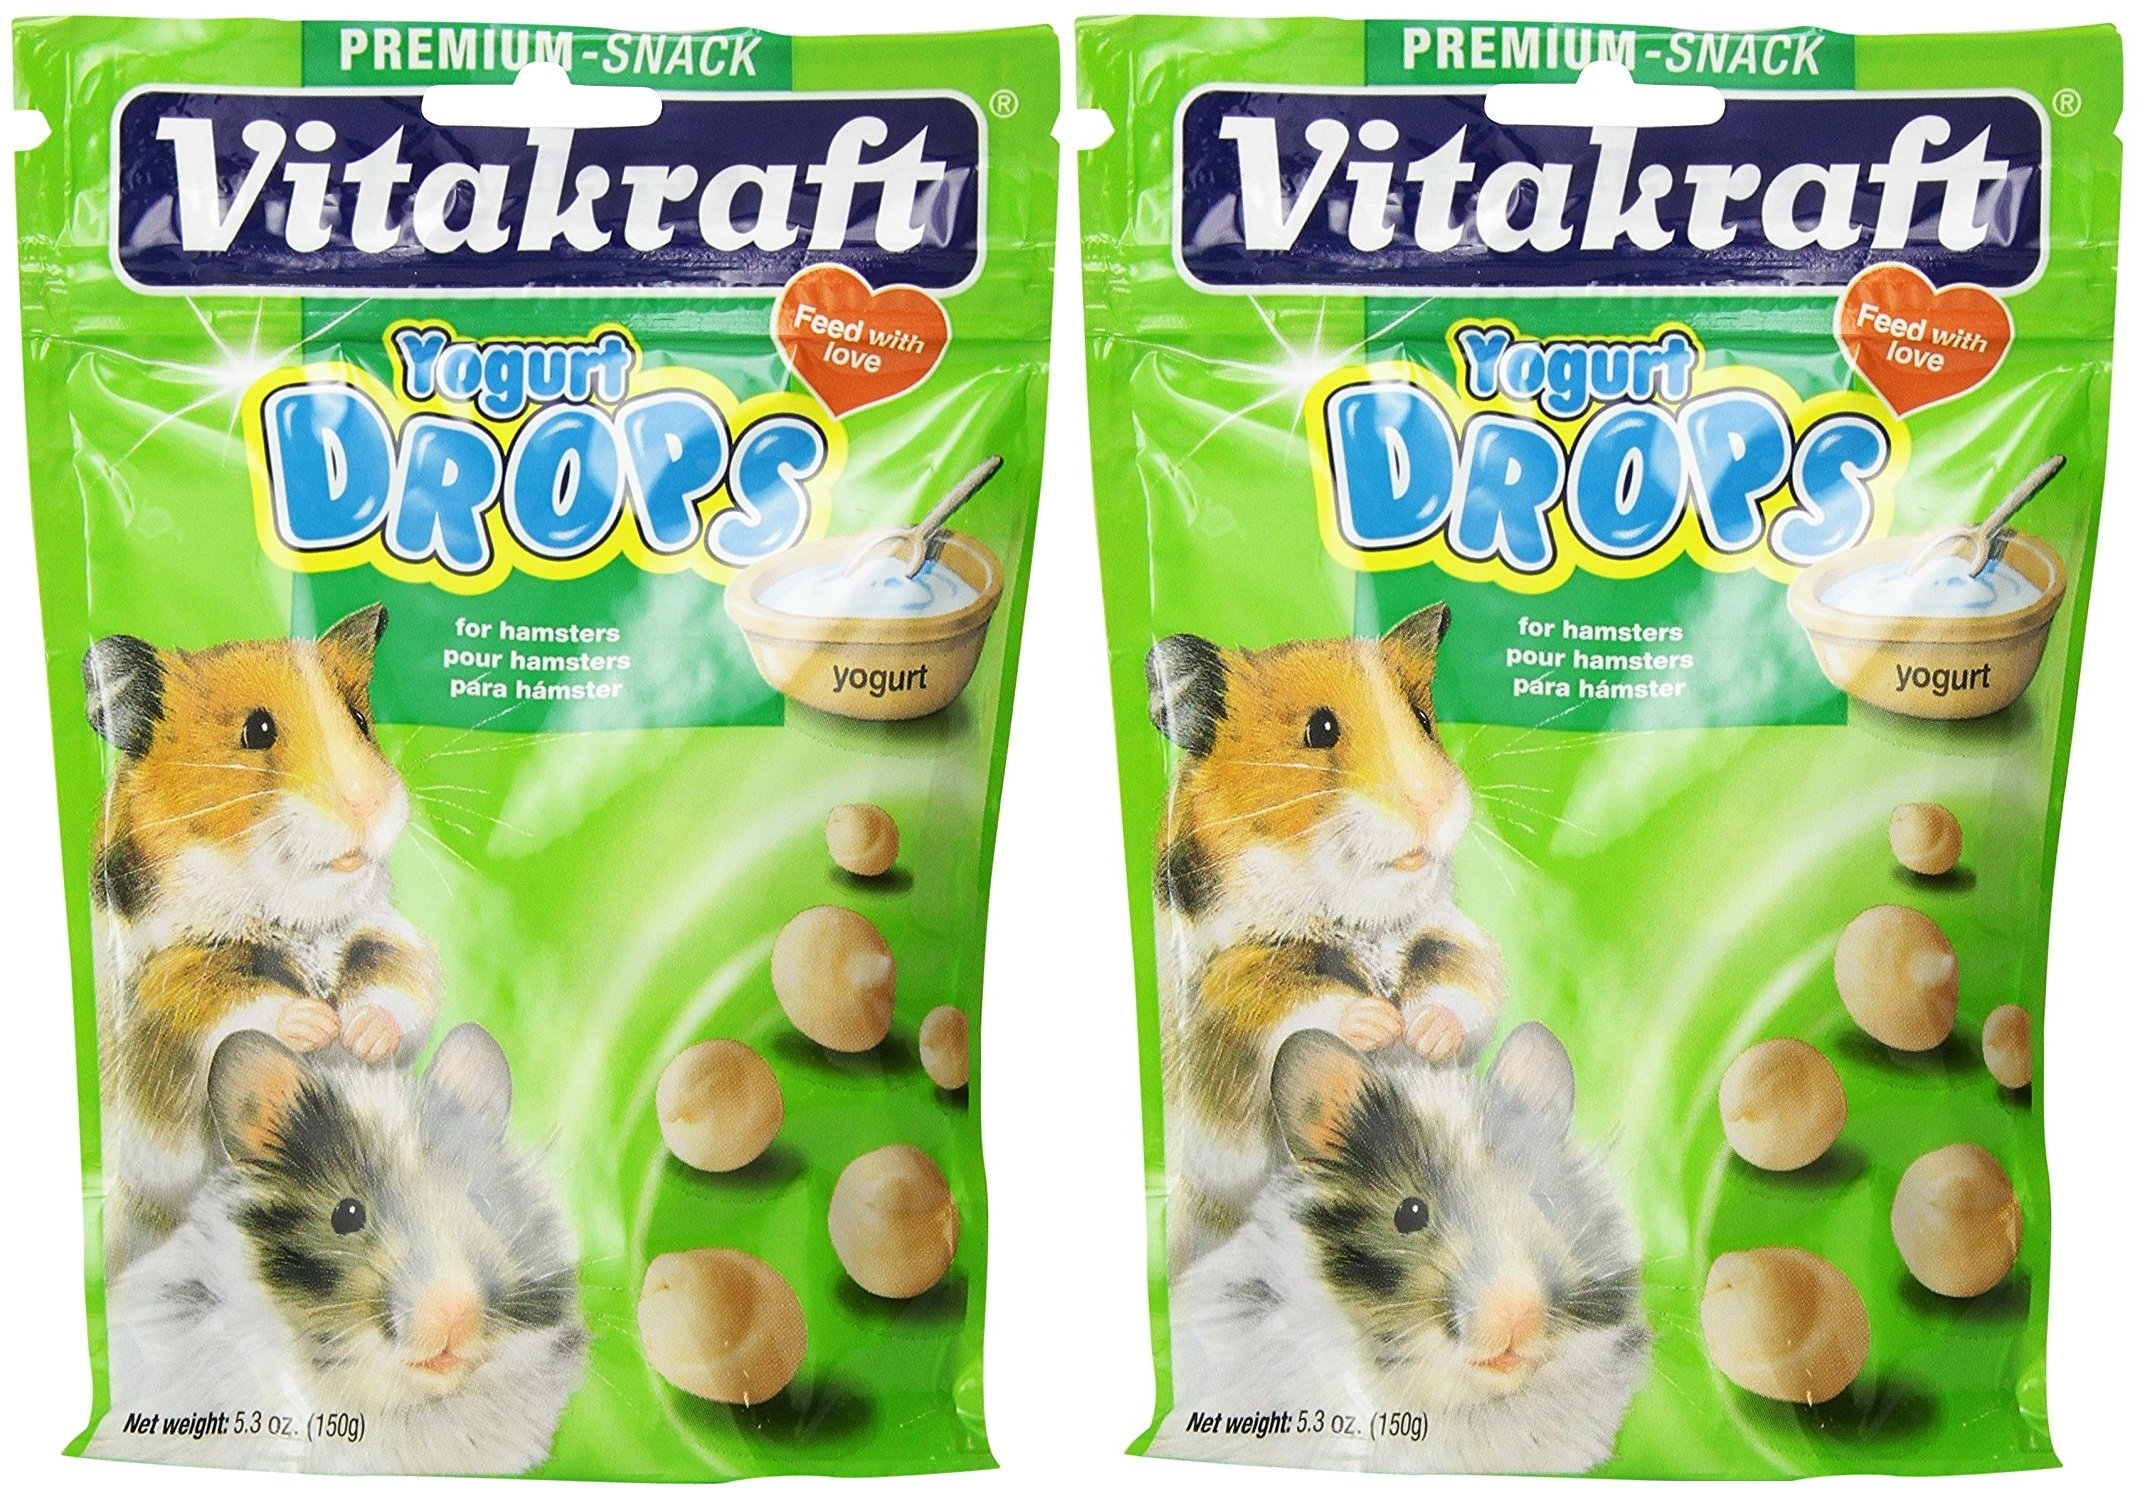 Vitakraft Yogurt Drops for Hamster Treat - 5 oz. [Set of 2] by Vitakraft